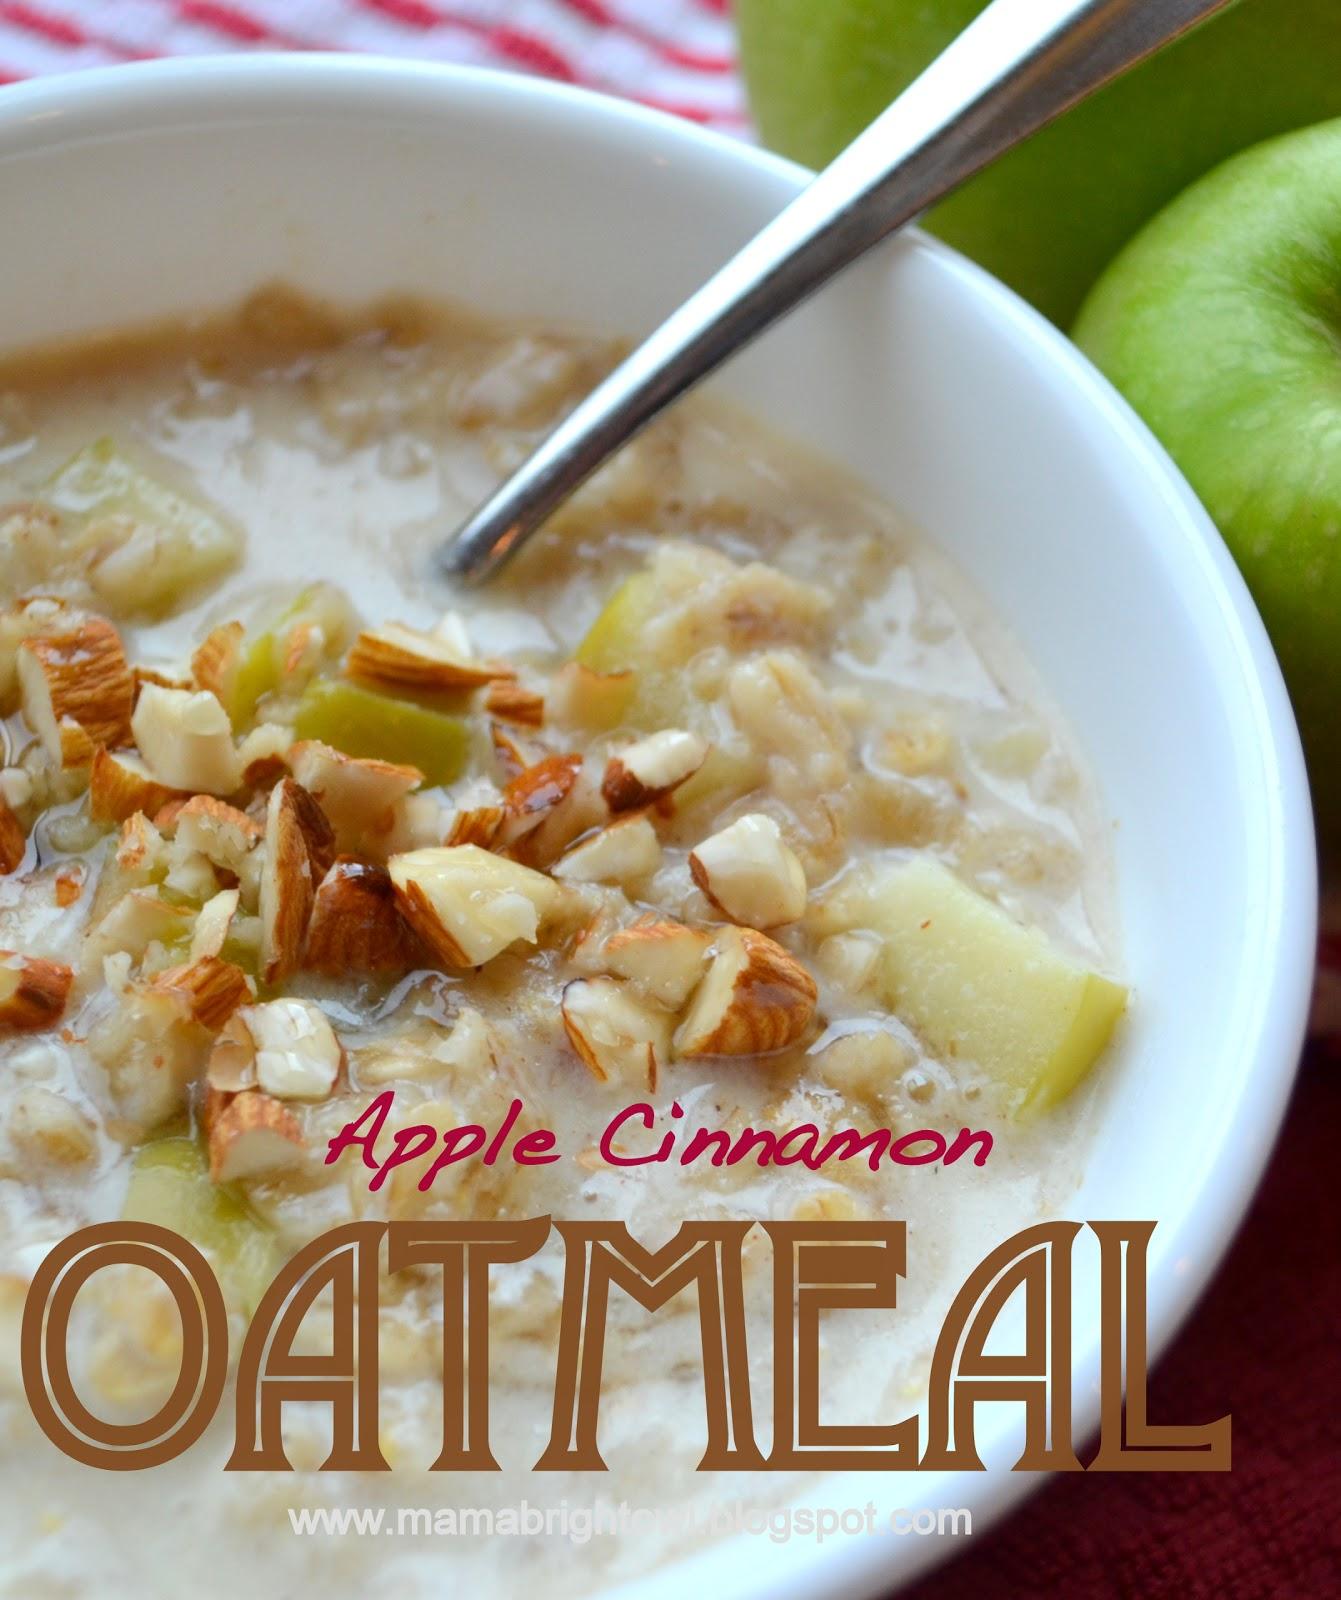 Mama Brightowl: Homemade Apple-Cinnamon Oatmeal